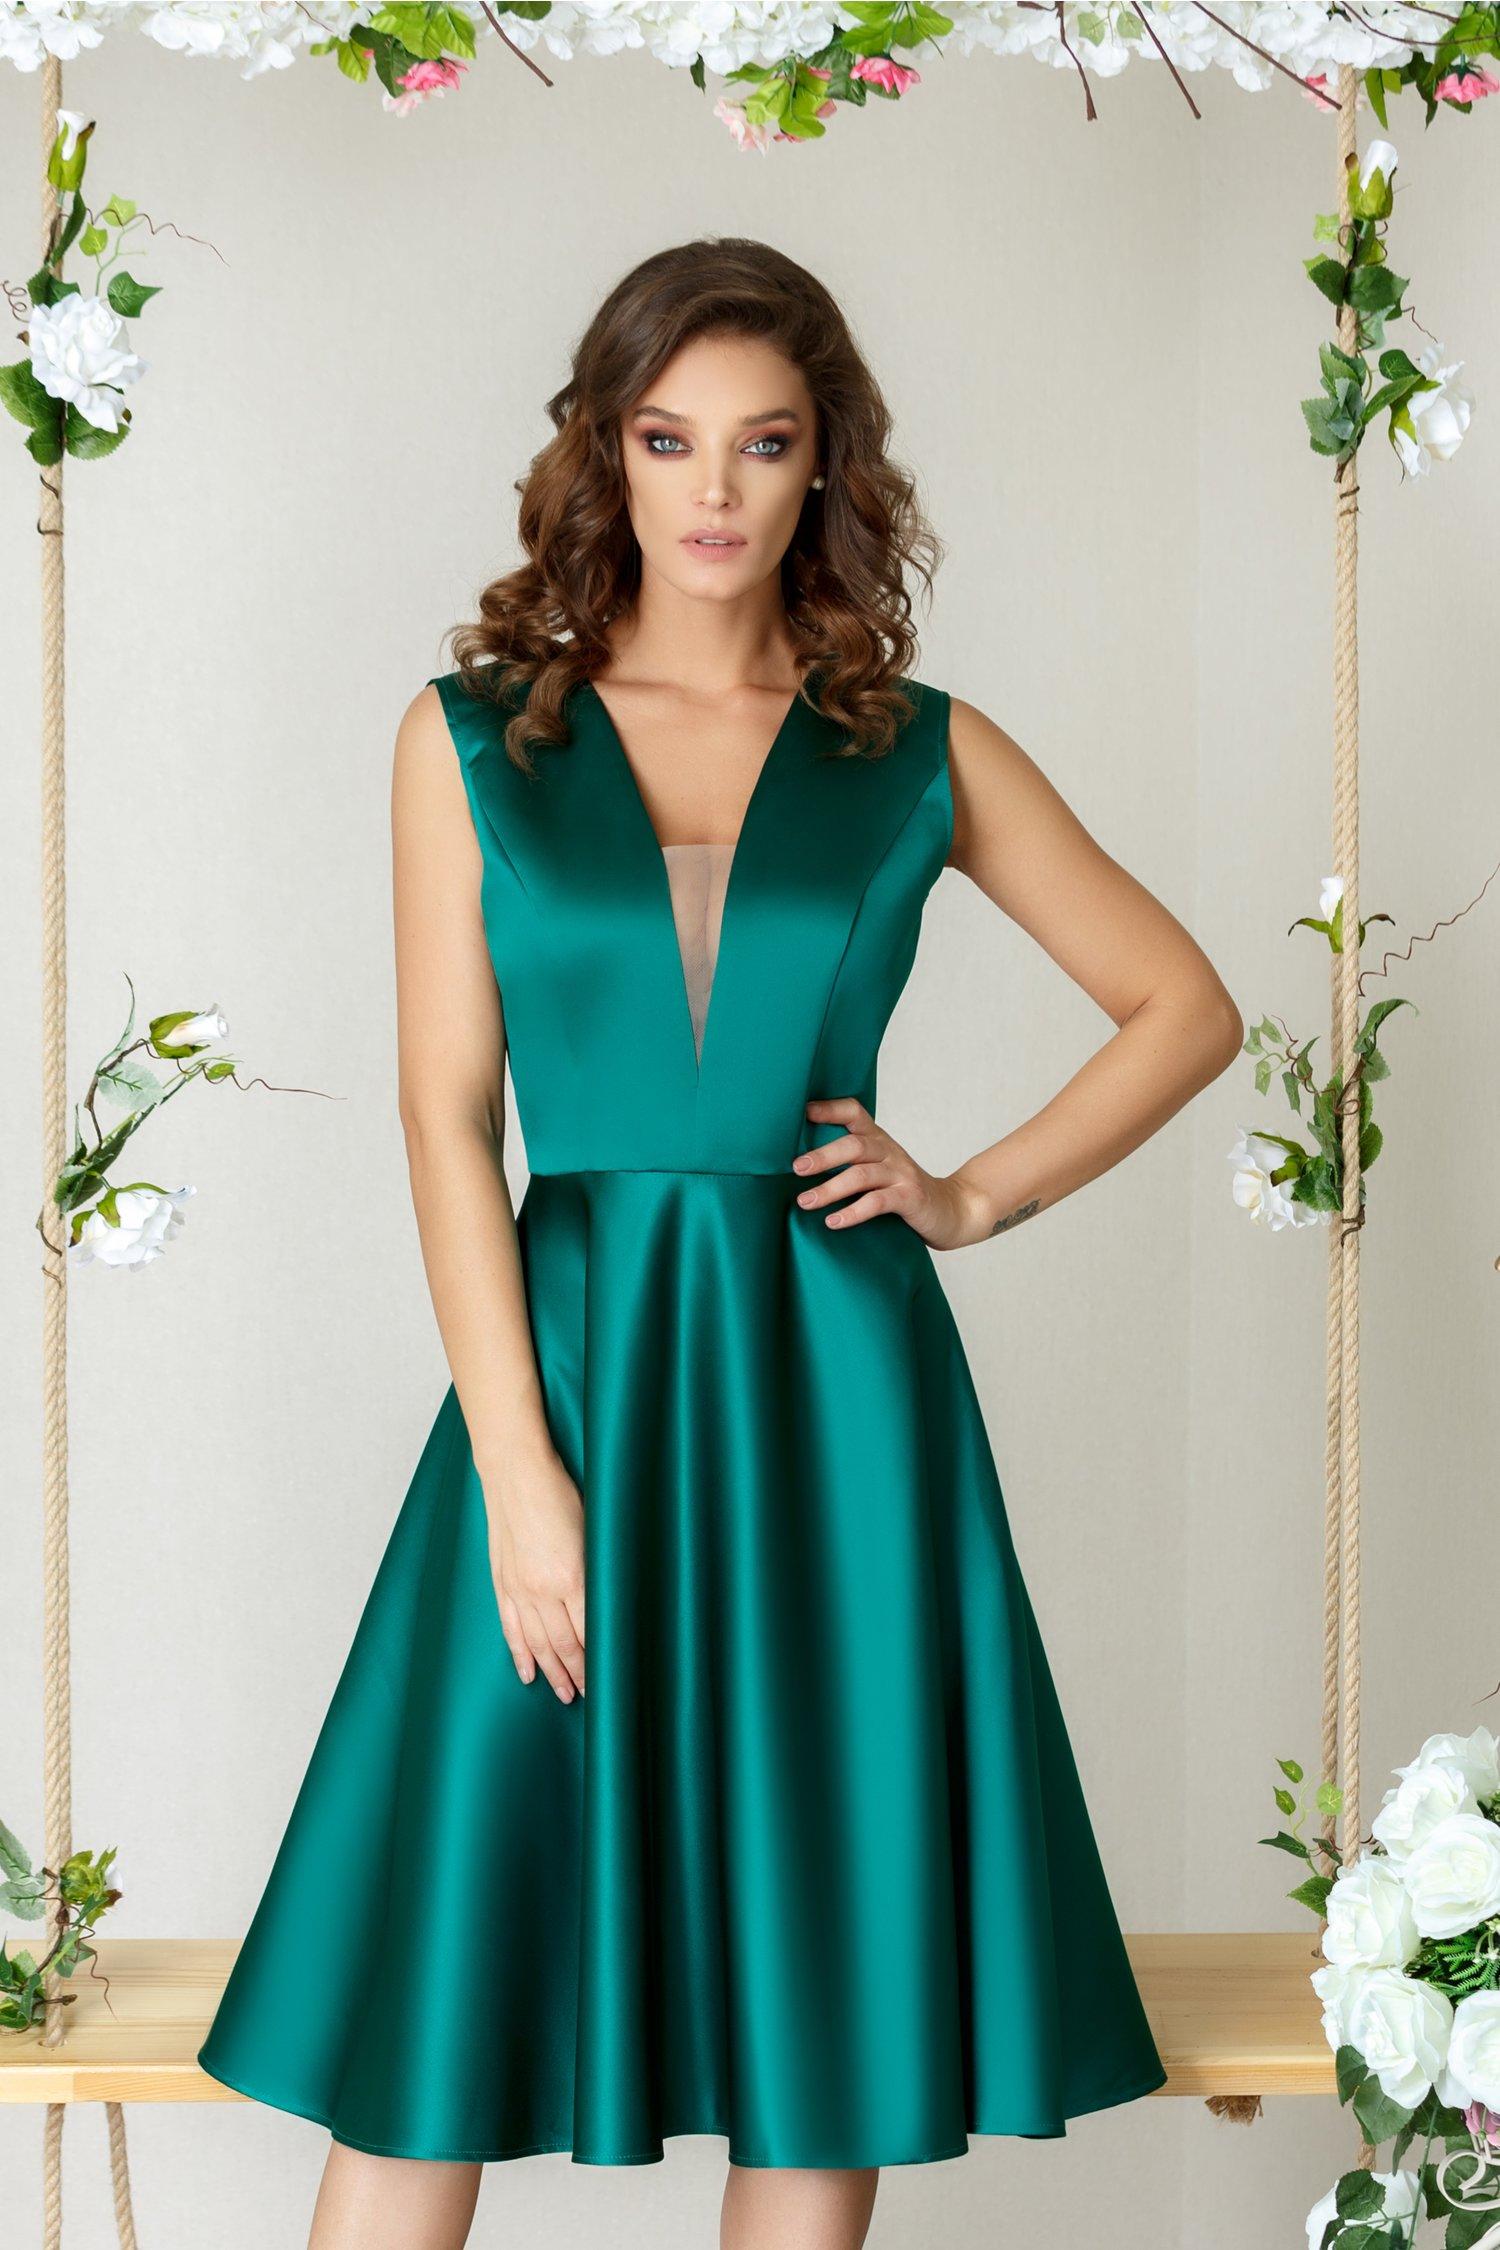 Rochie Brise Sharon verde cu decolteu midi eleganta